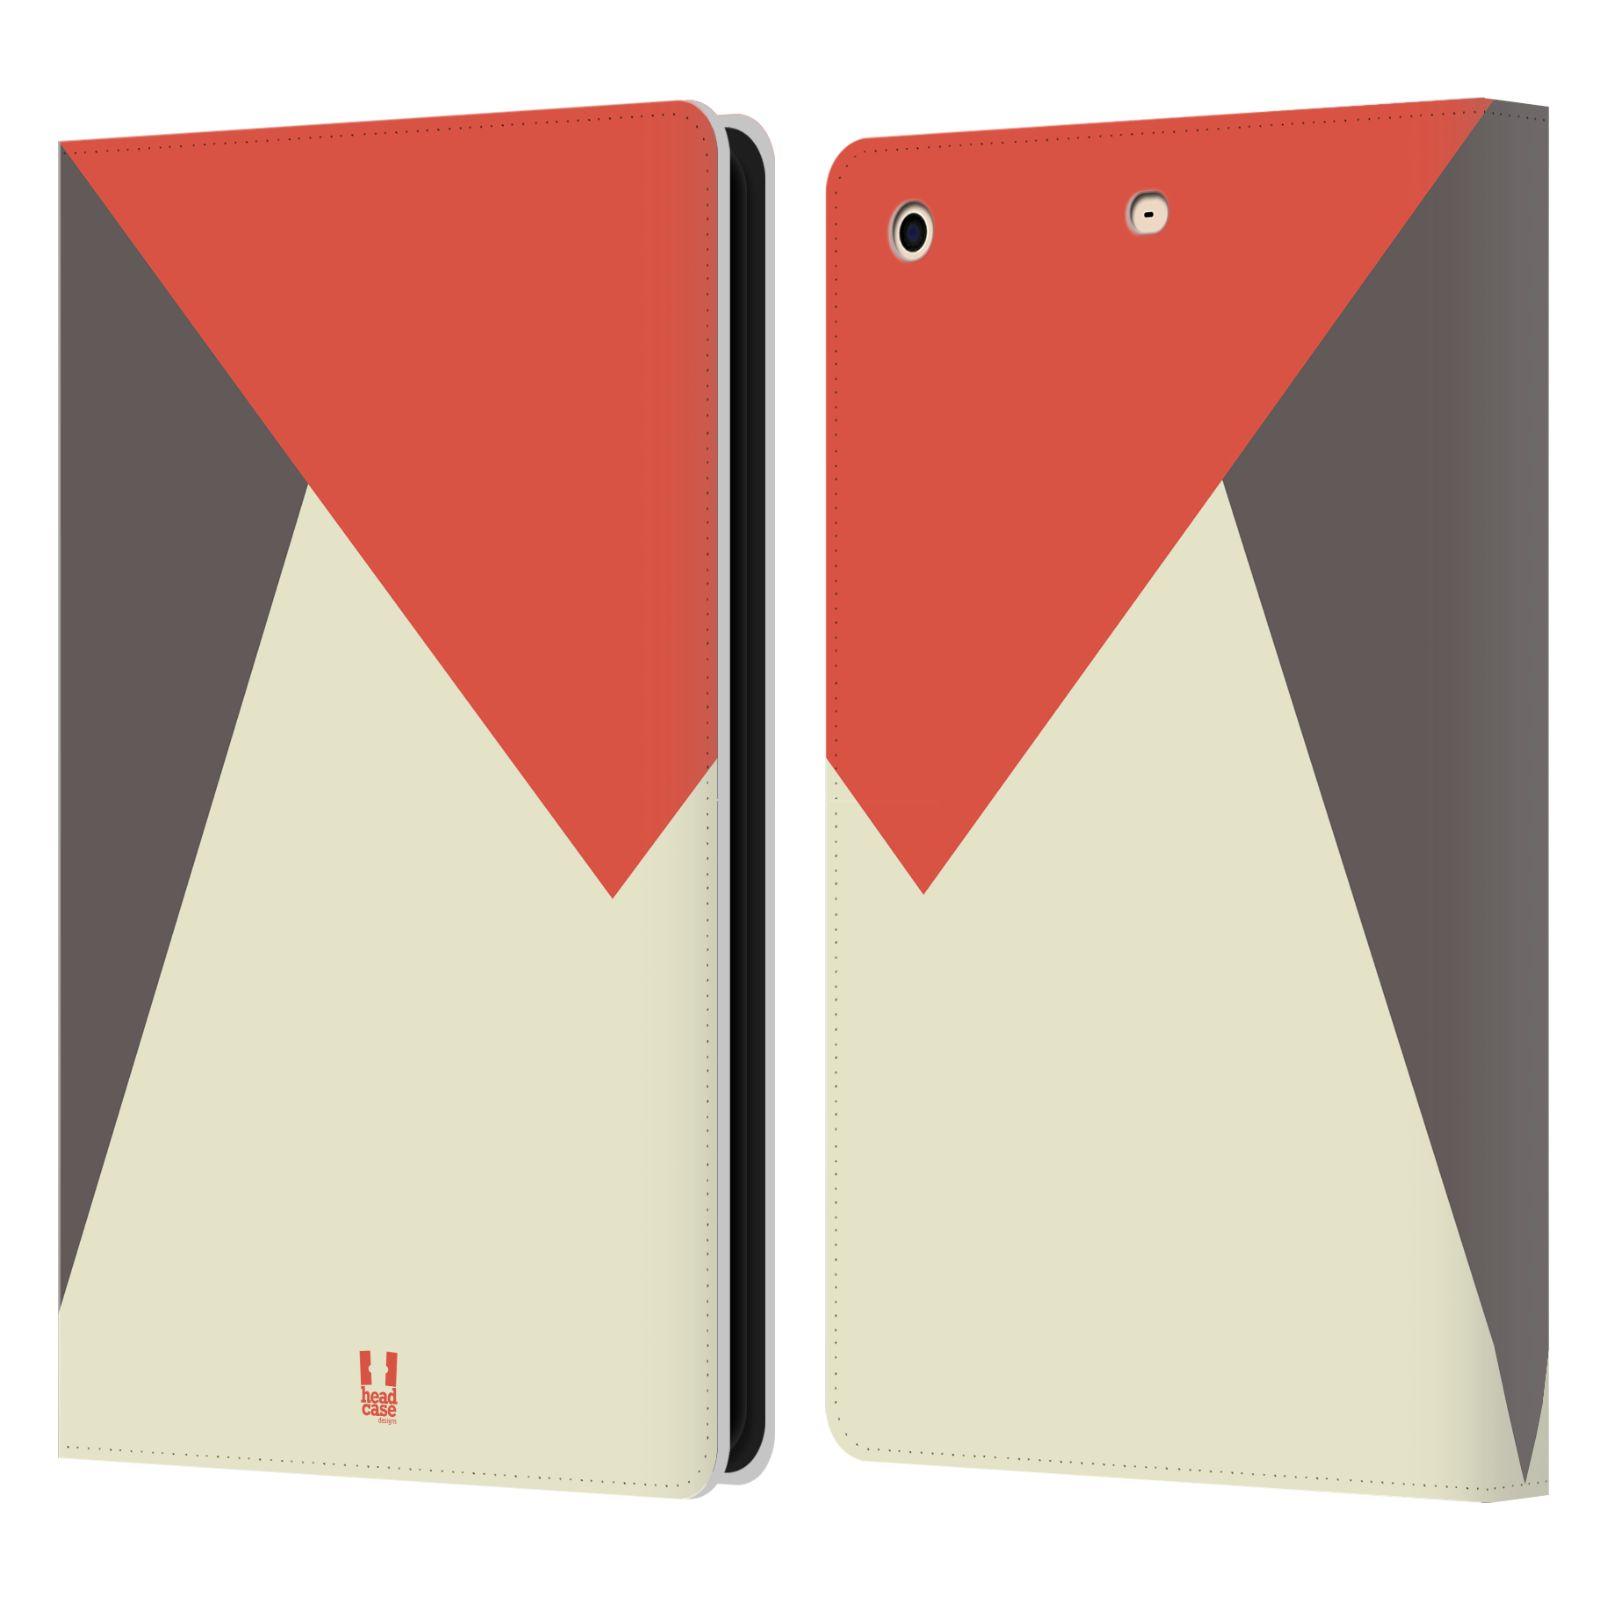 HEAD CASE Flipové pouzdro pro tablet Apple iPad mini barevné tvary červená a šedá COOL